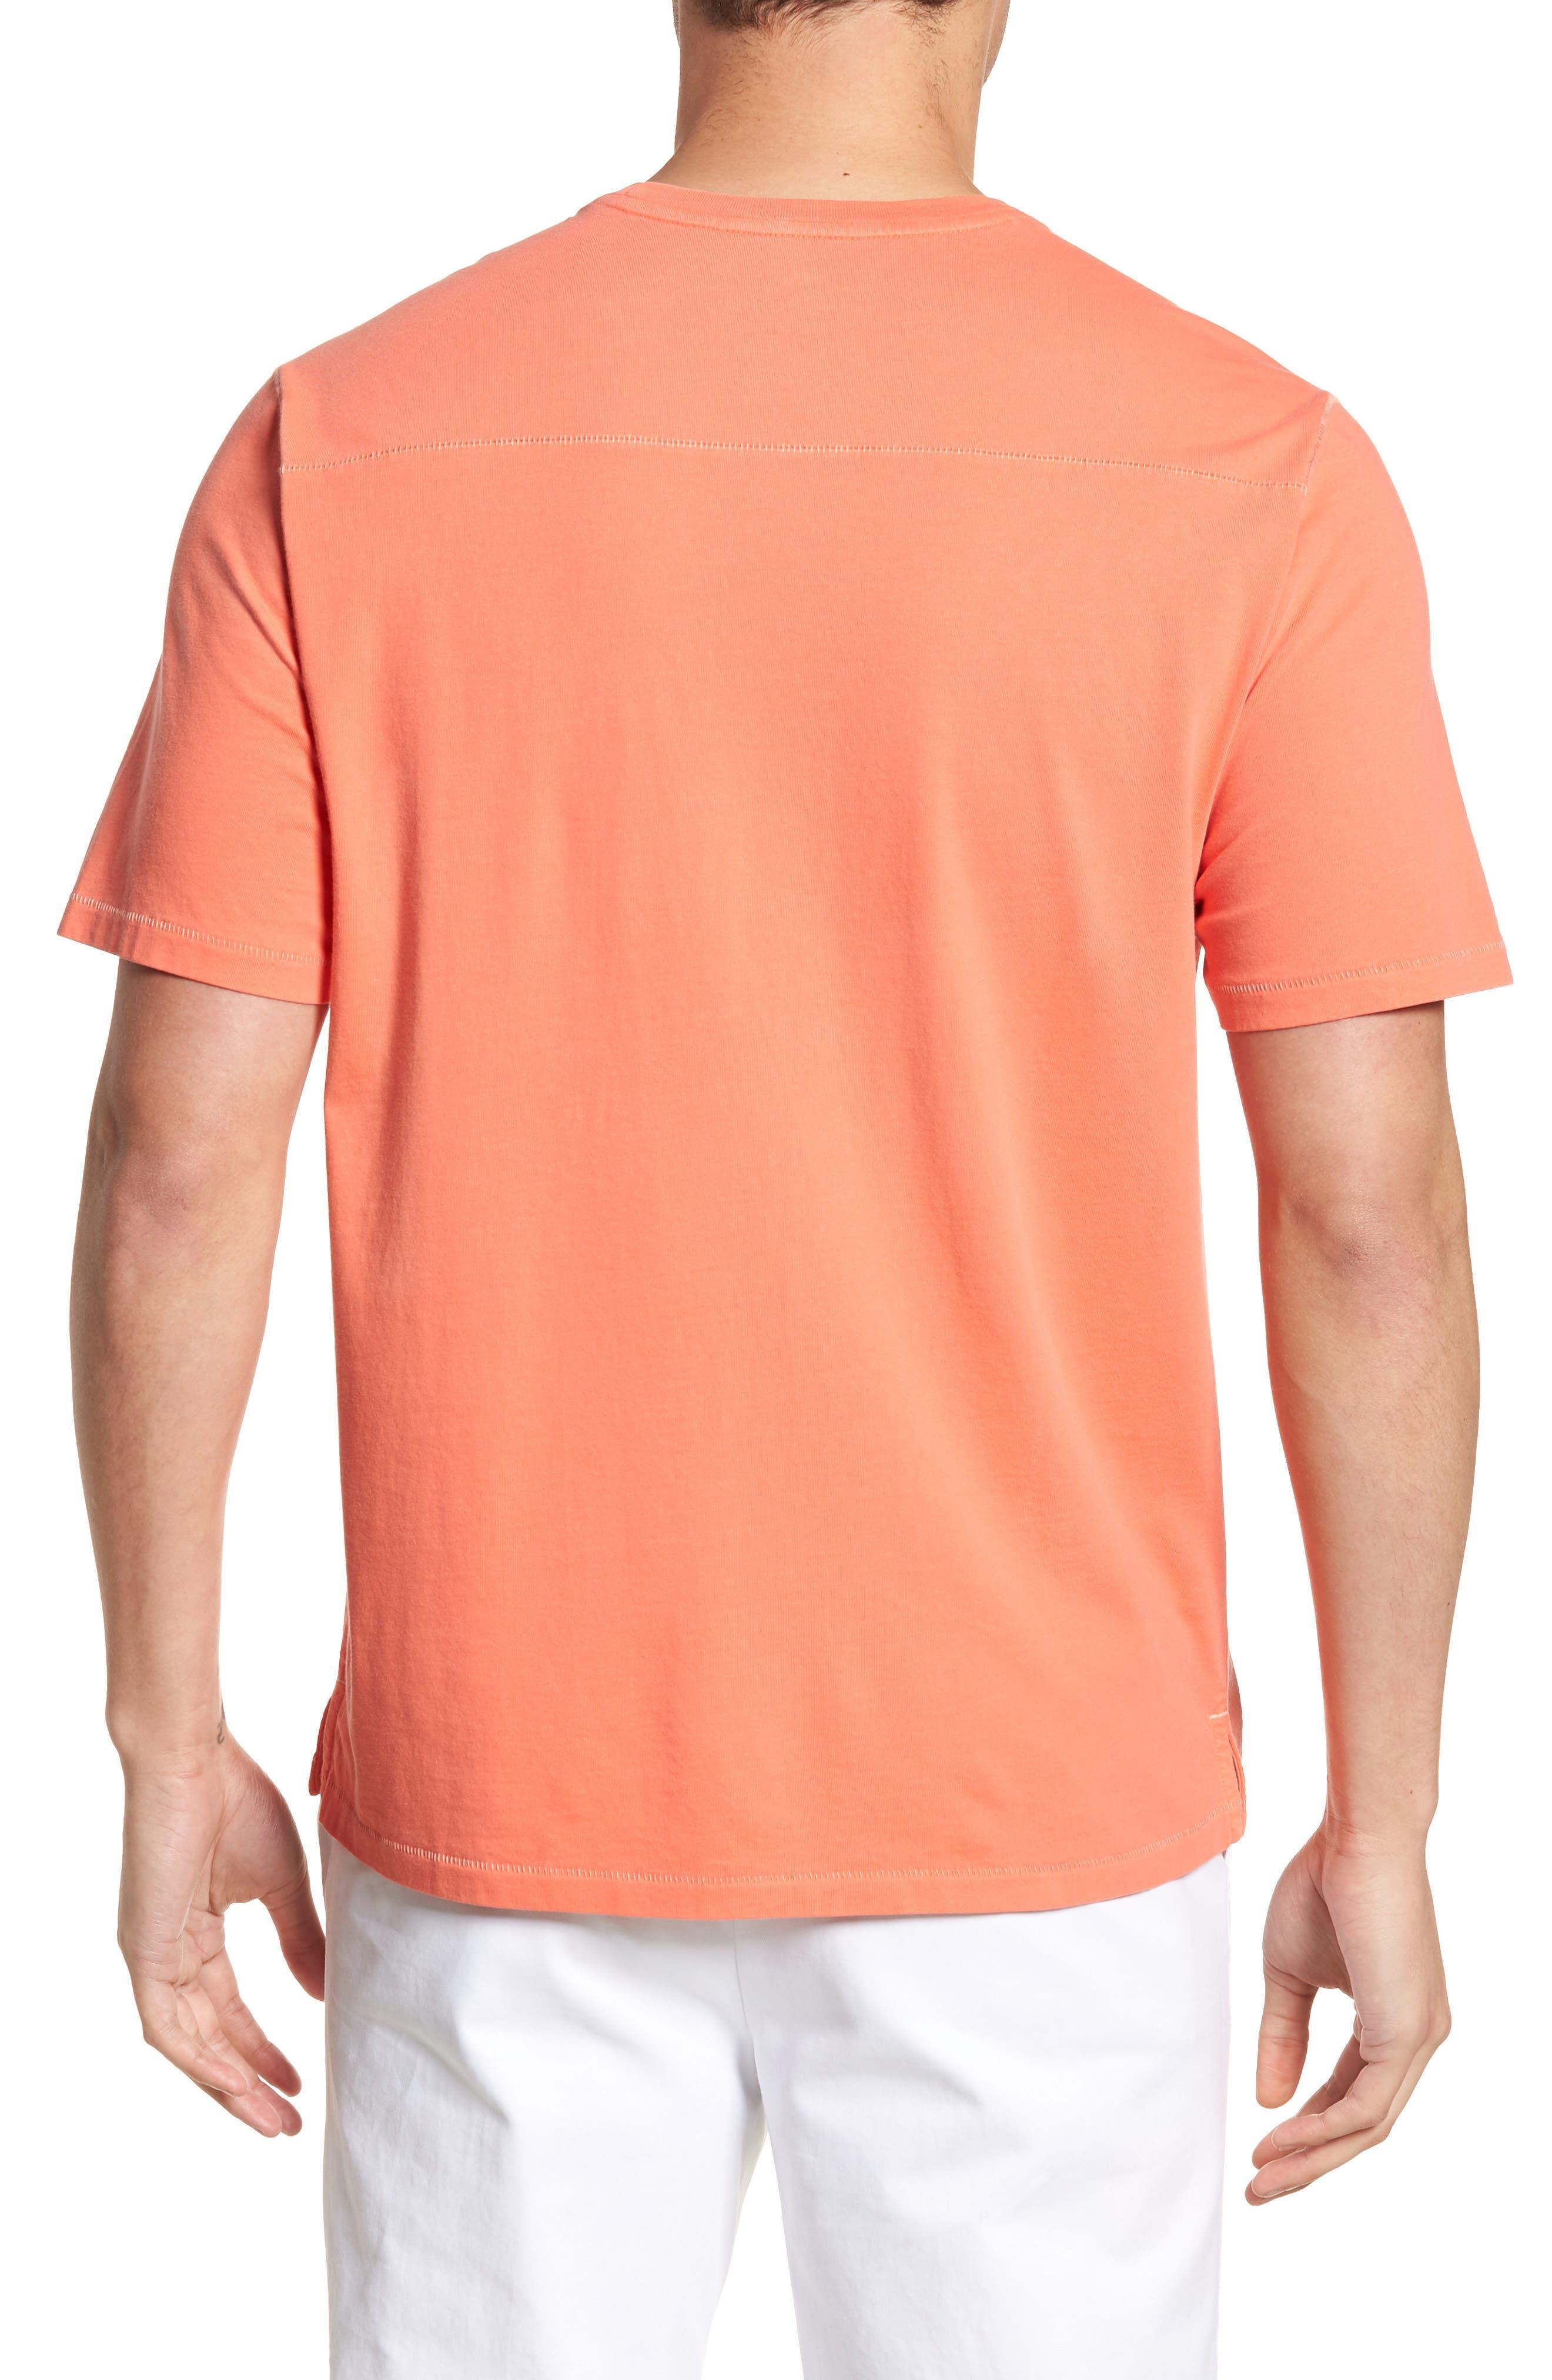 Alternate Image 2  - Tommy Bahama 'New Bahama Reef' Island Modern Fit Pima Cotton Pocket T-Shirt